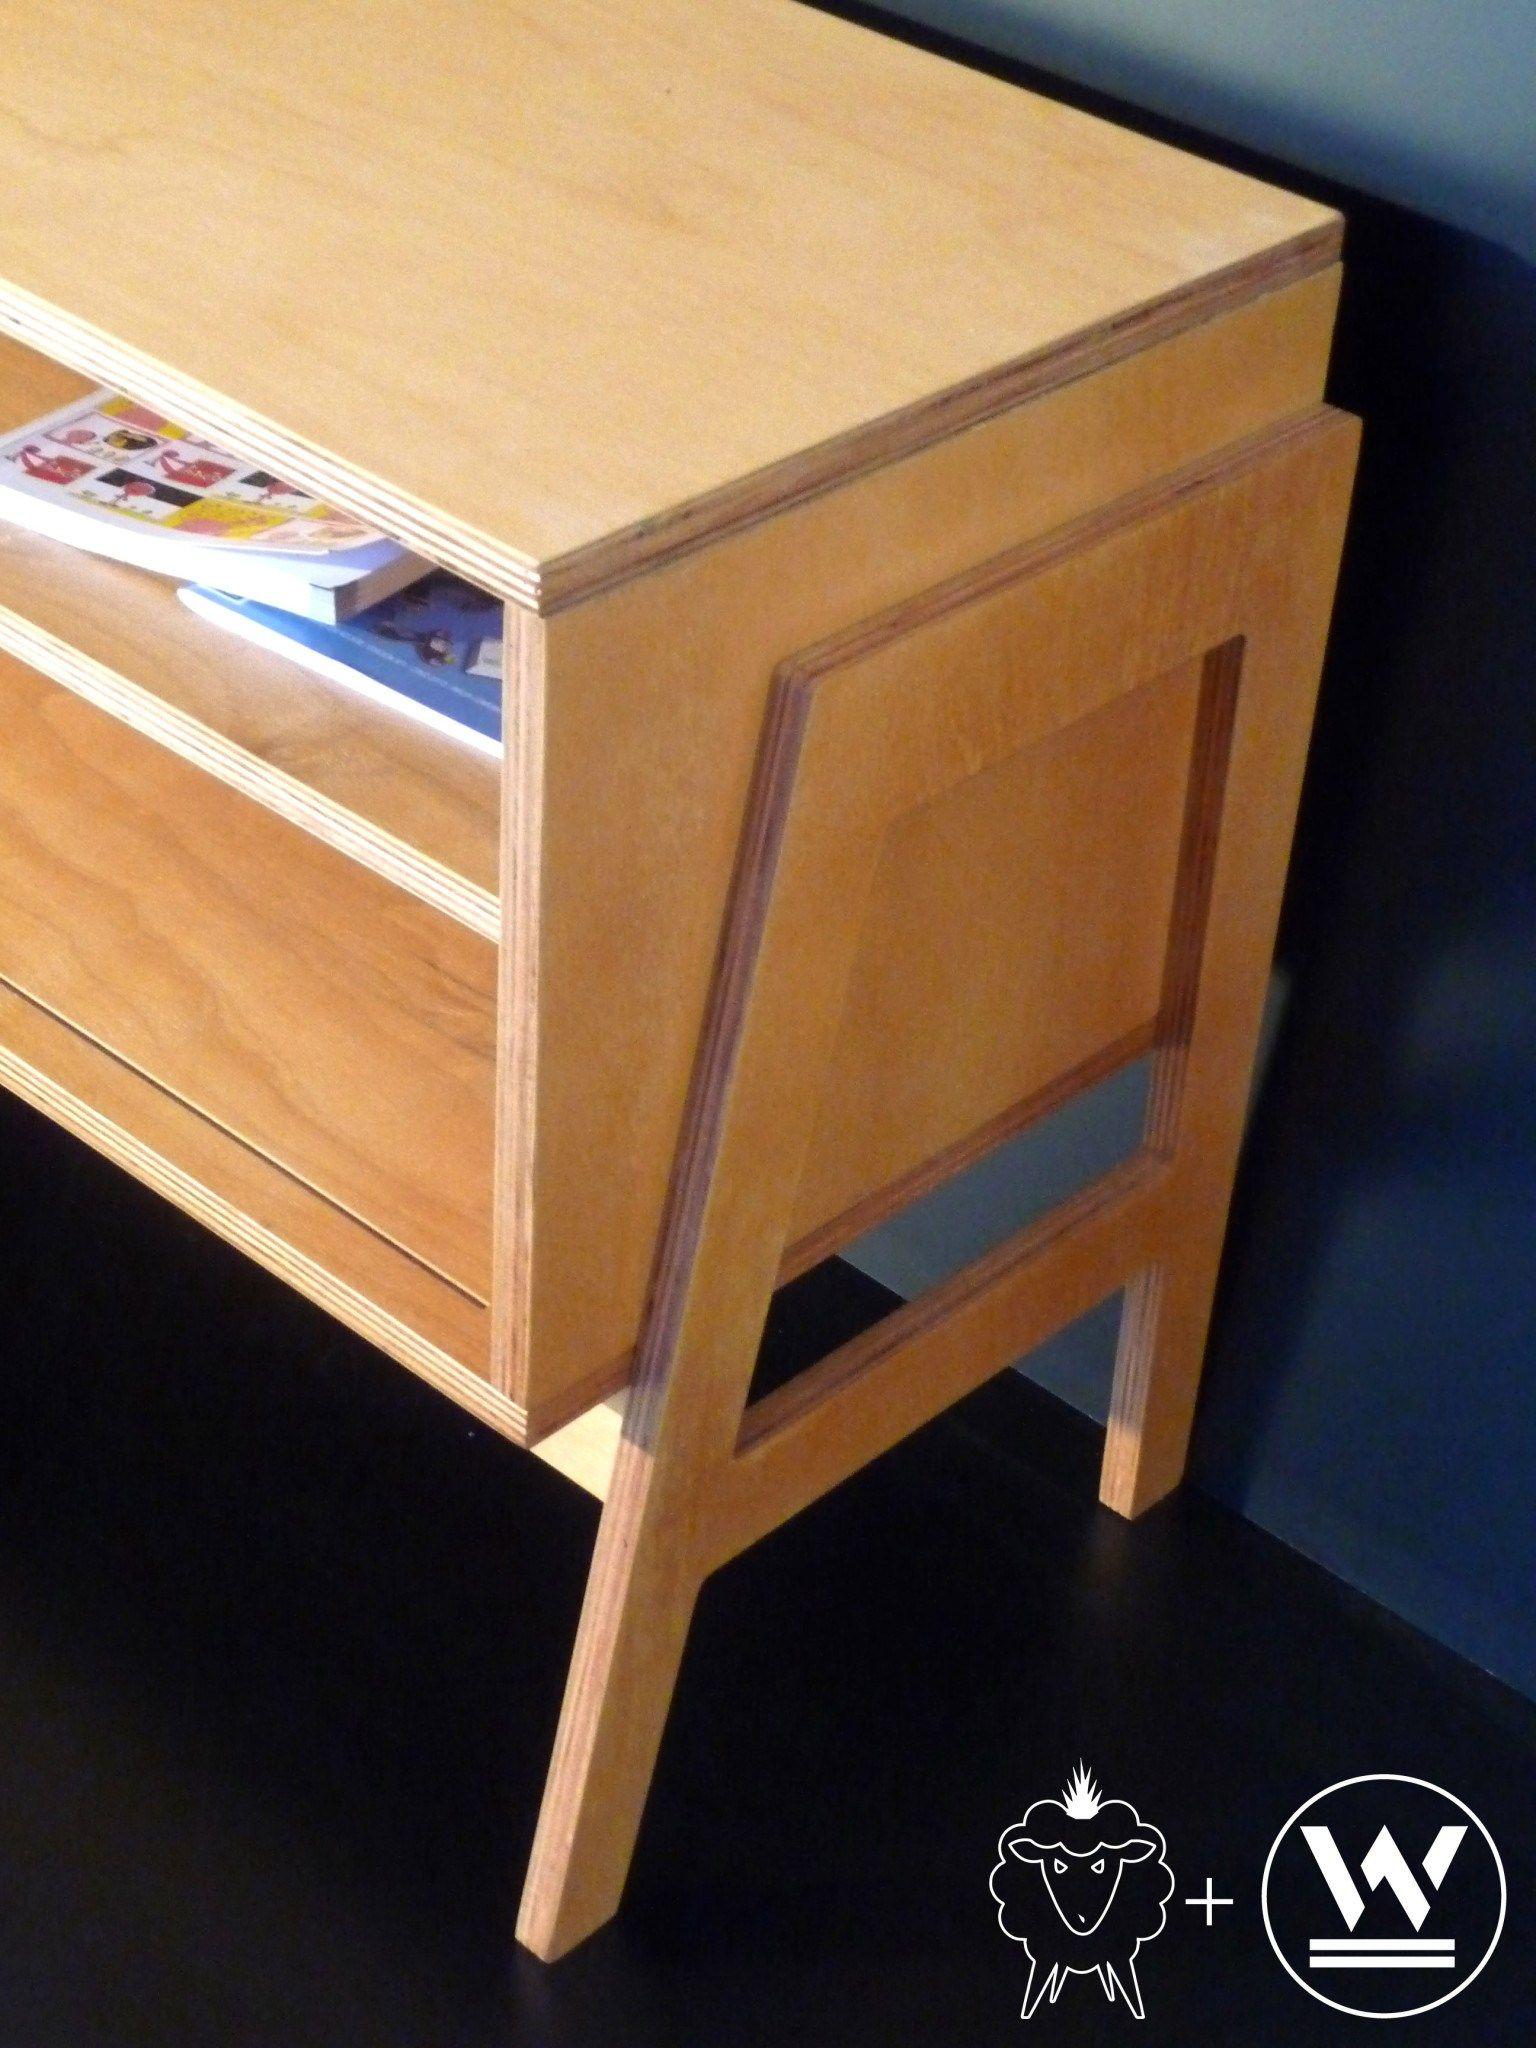 Mueble Bajo New Louis Medidas 165cm Largo 40cm De Prof  # Muebles Watambu